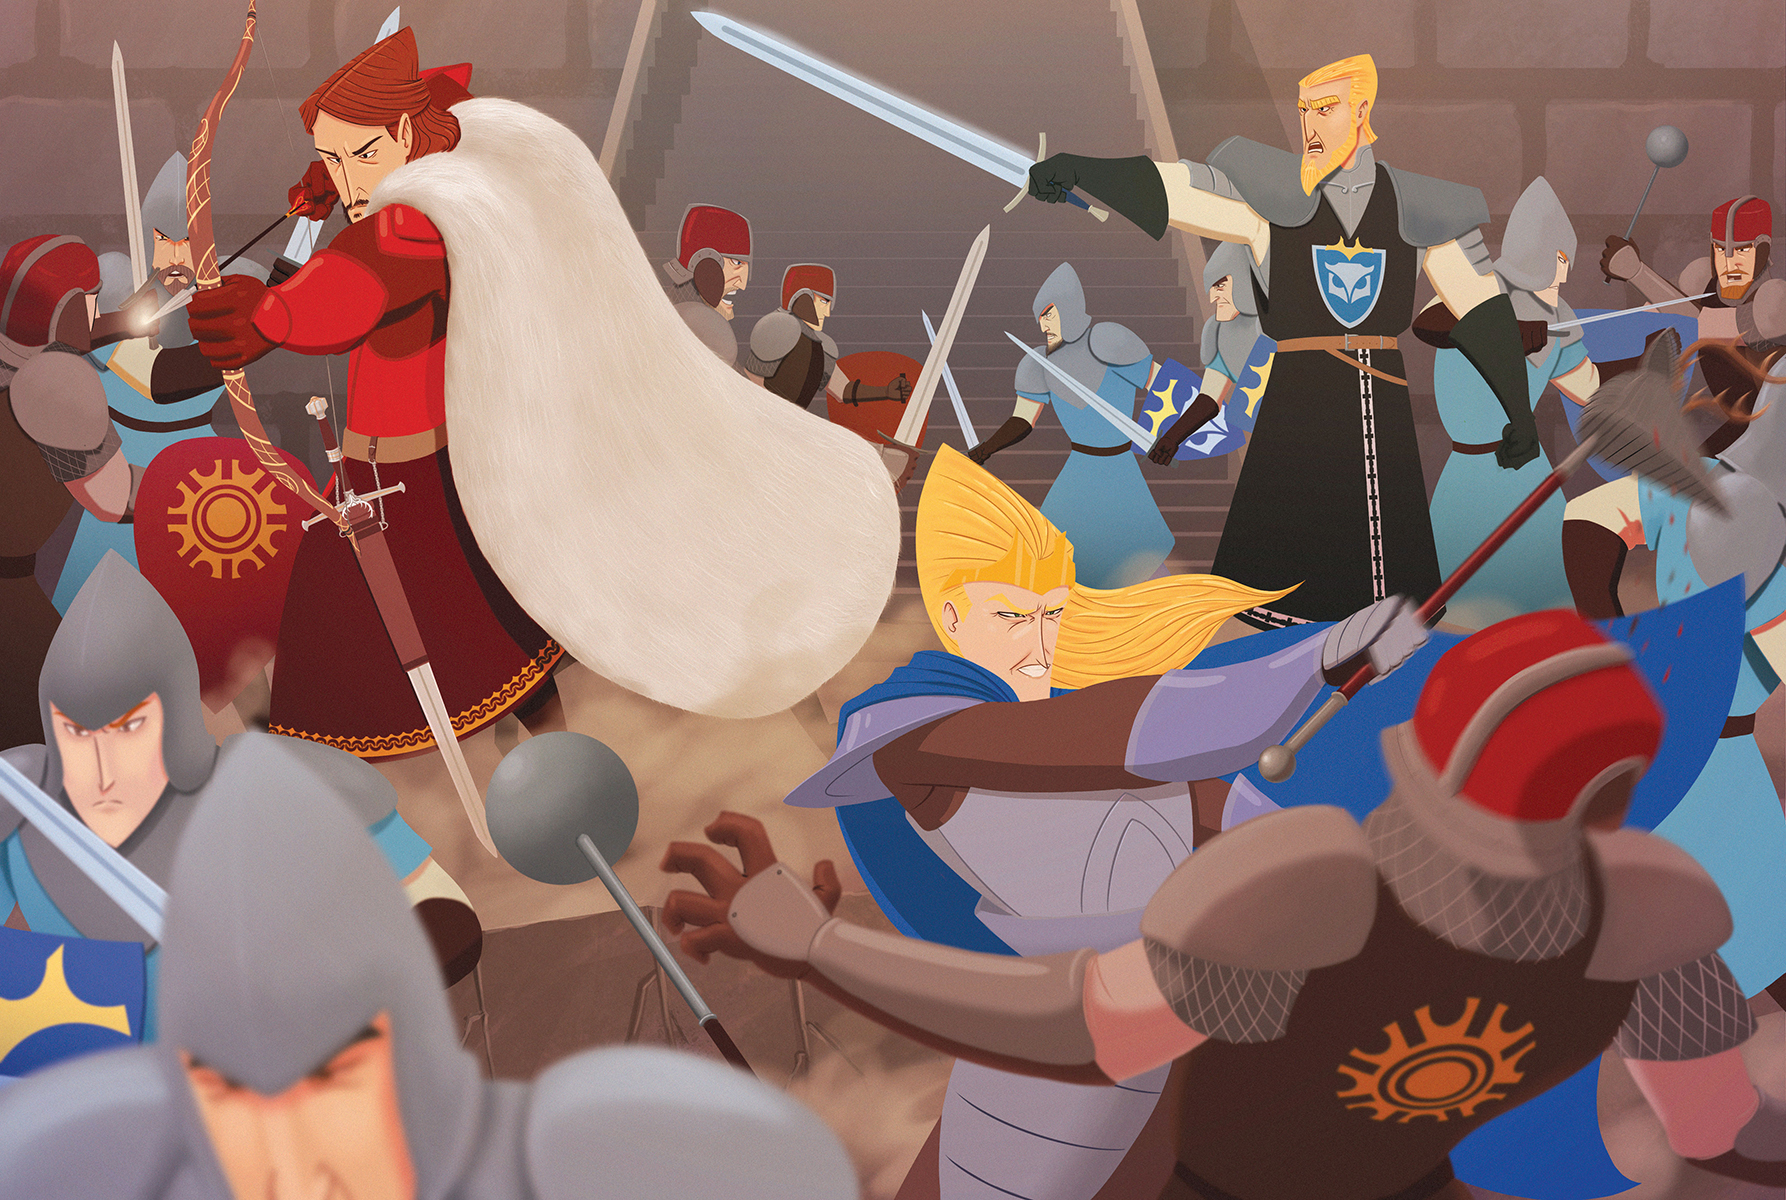 Battle in the courtyard